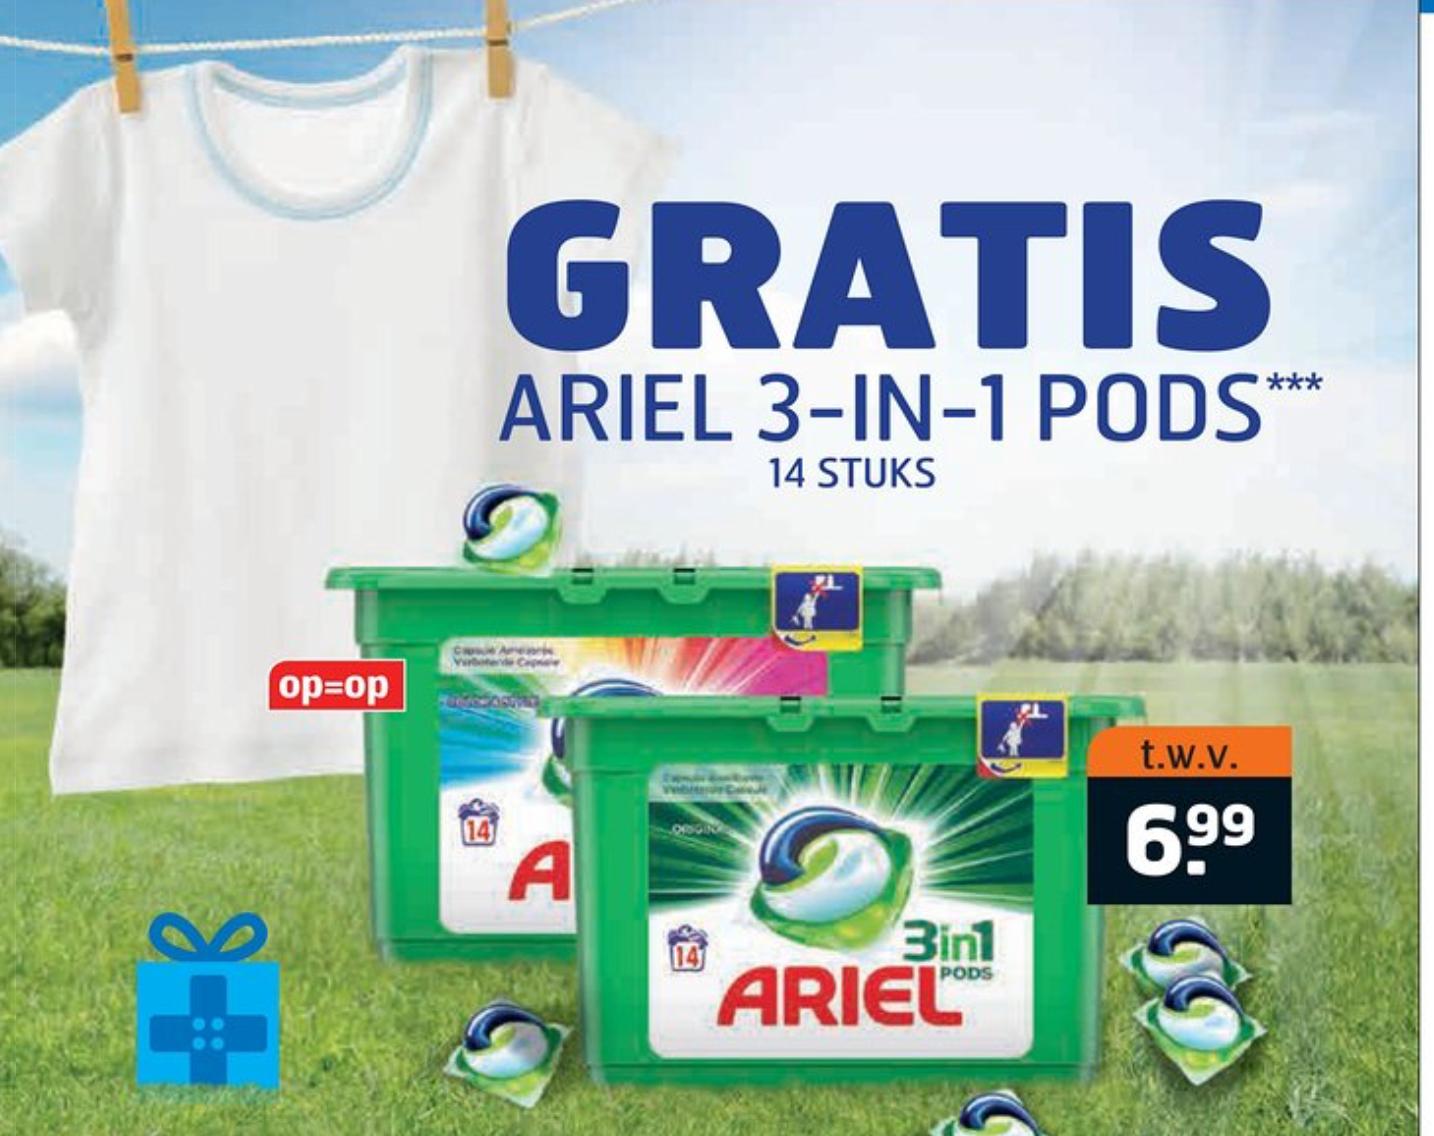 Gratis Ariël 3 in 1 pods 14 stuks twv € 6,99 @trekpleister